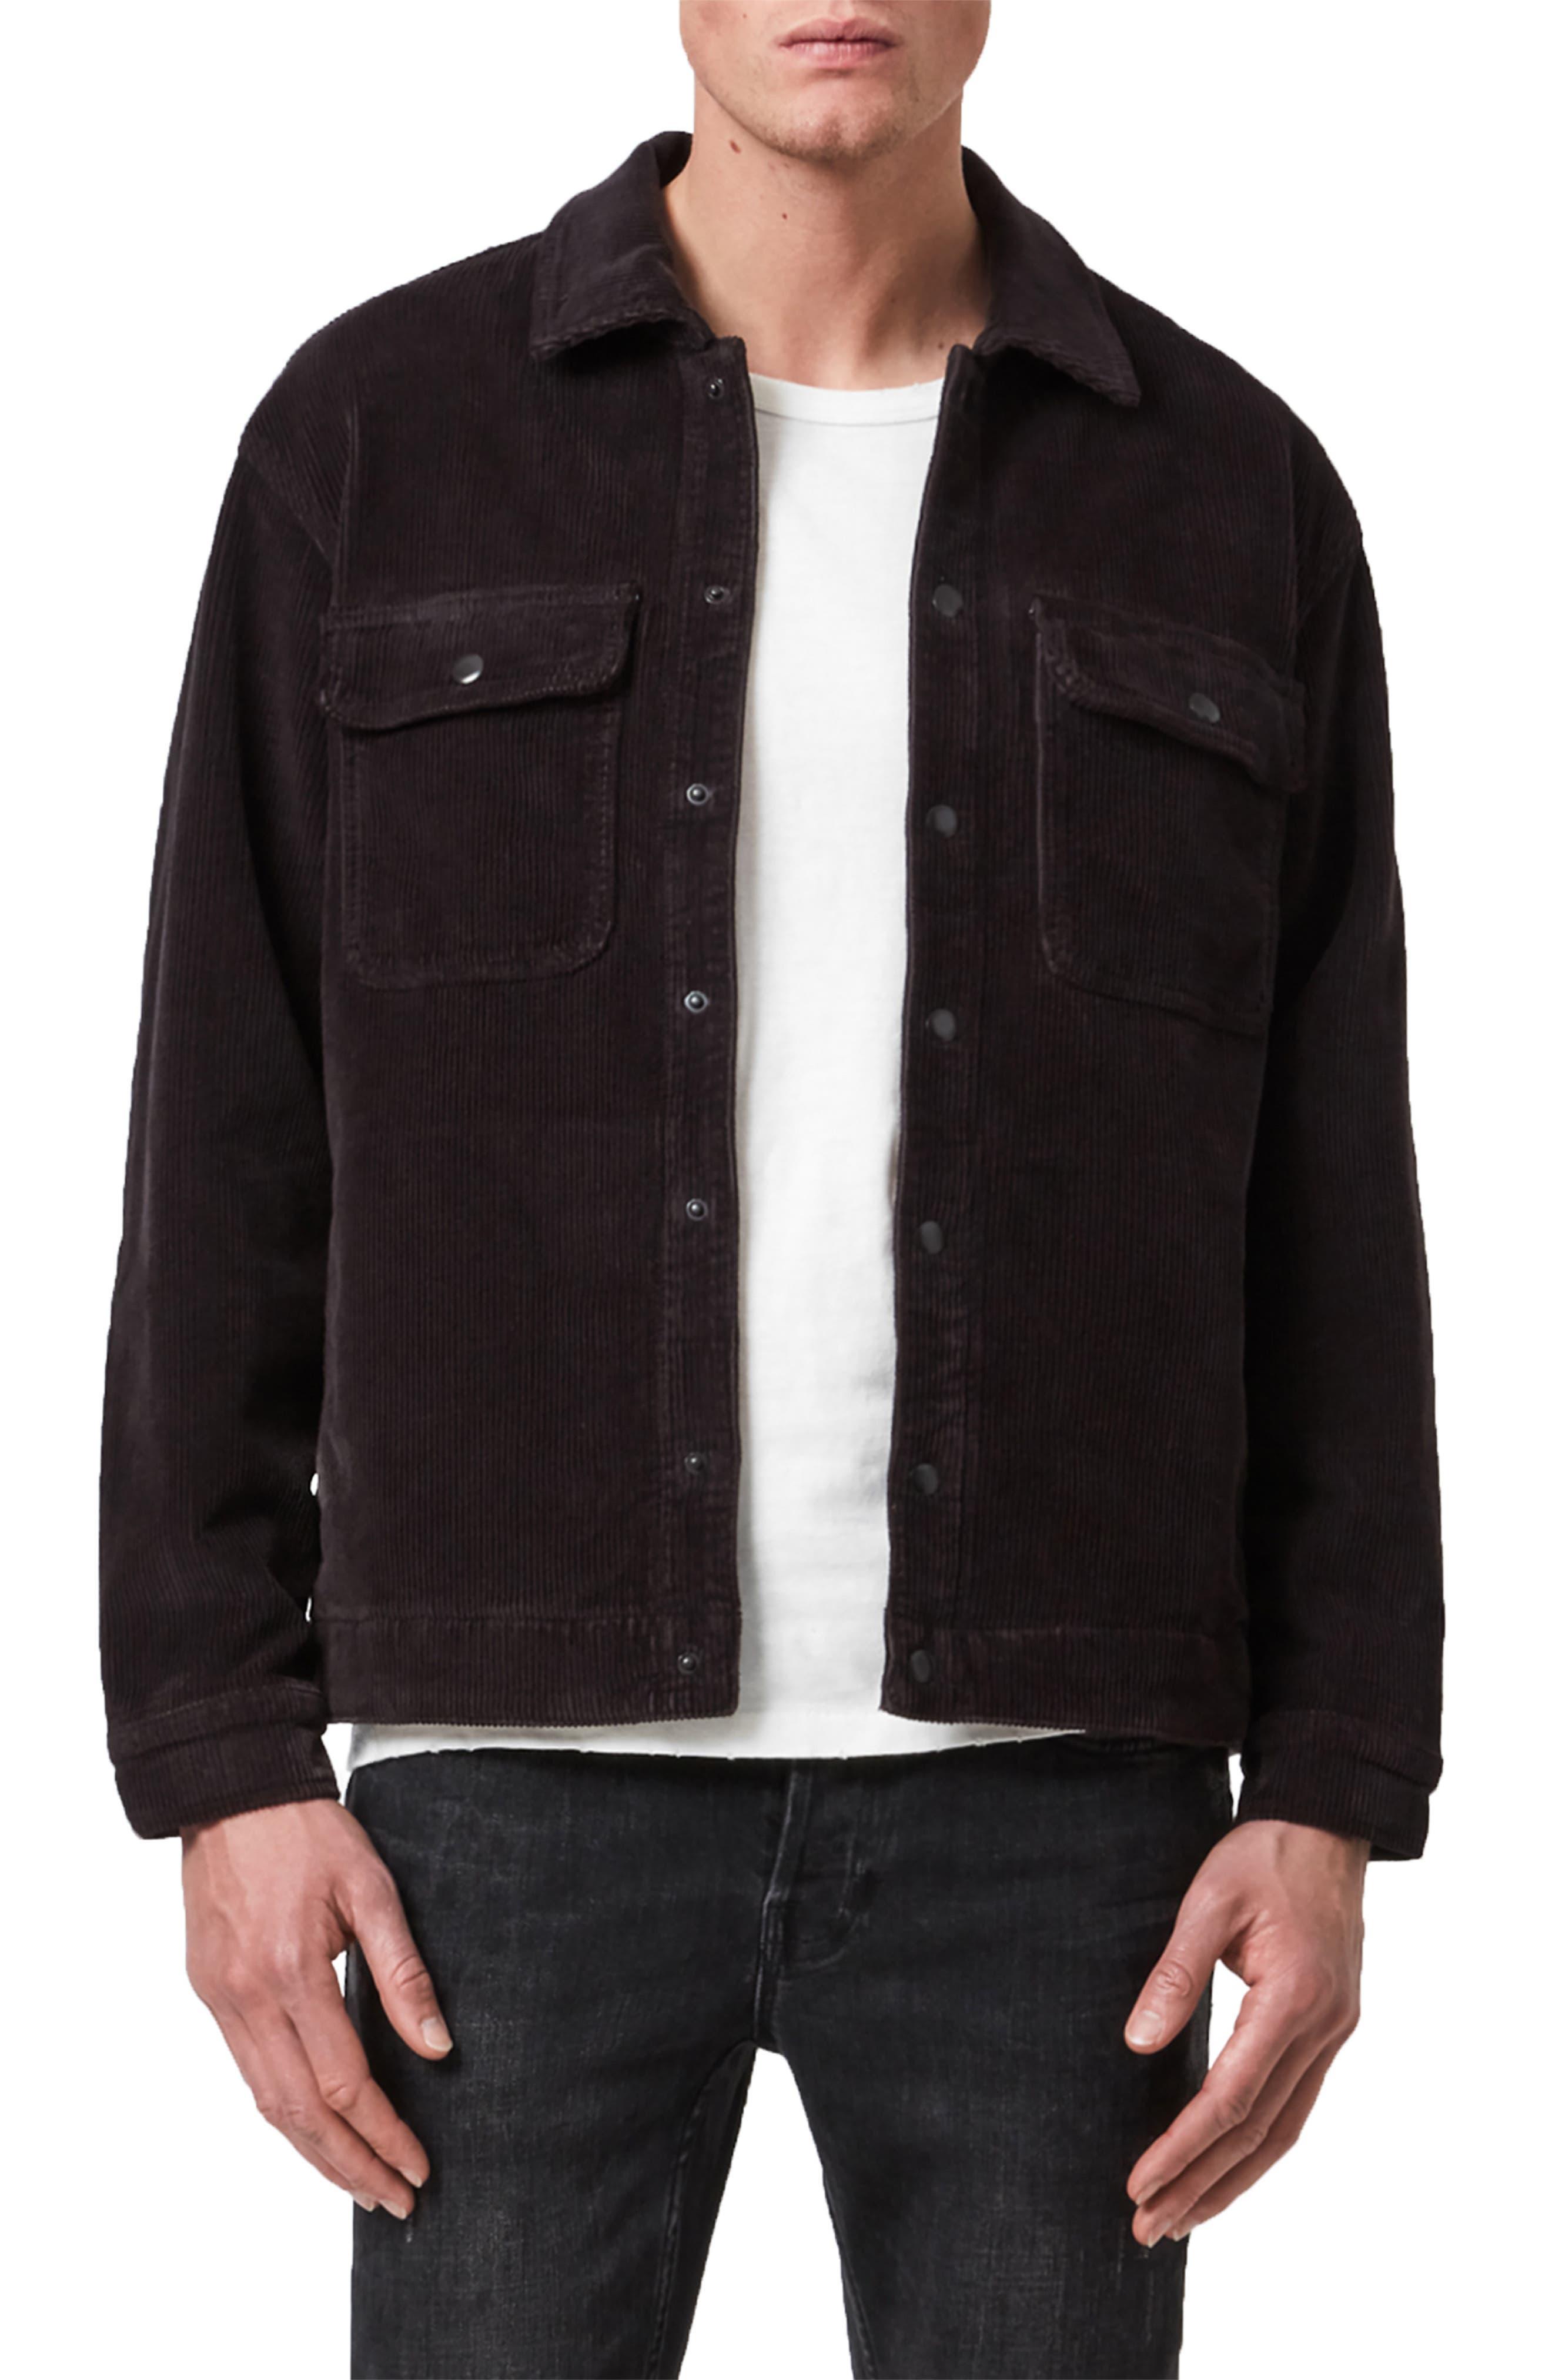 Coronet Snap-Up Corduroy Jacket